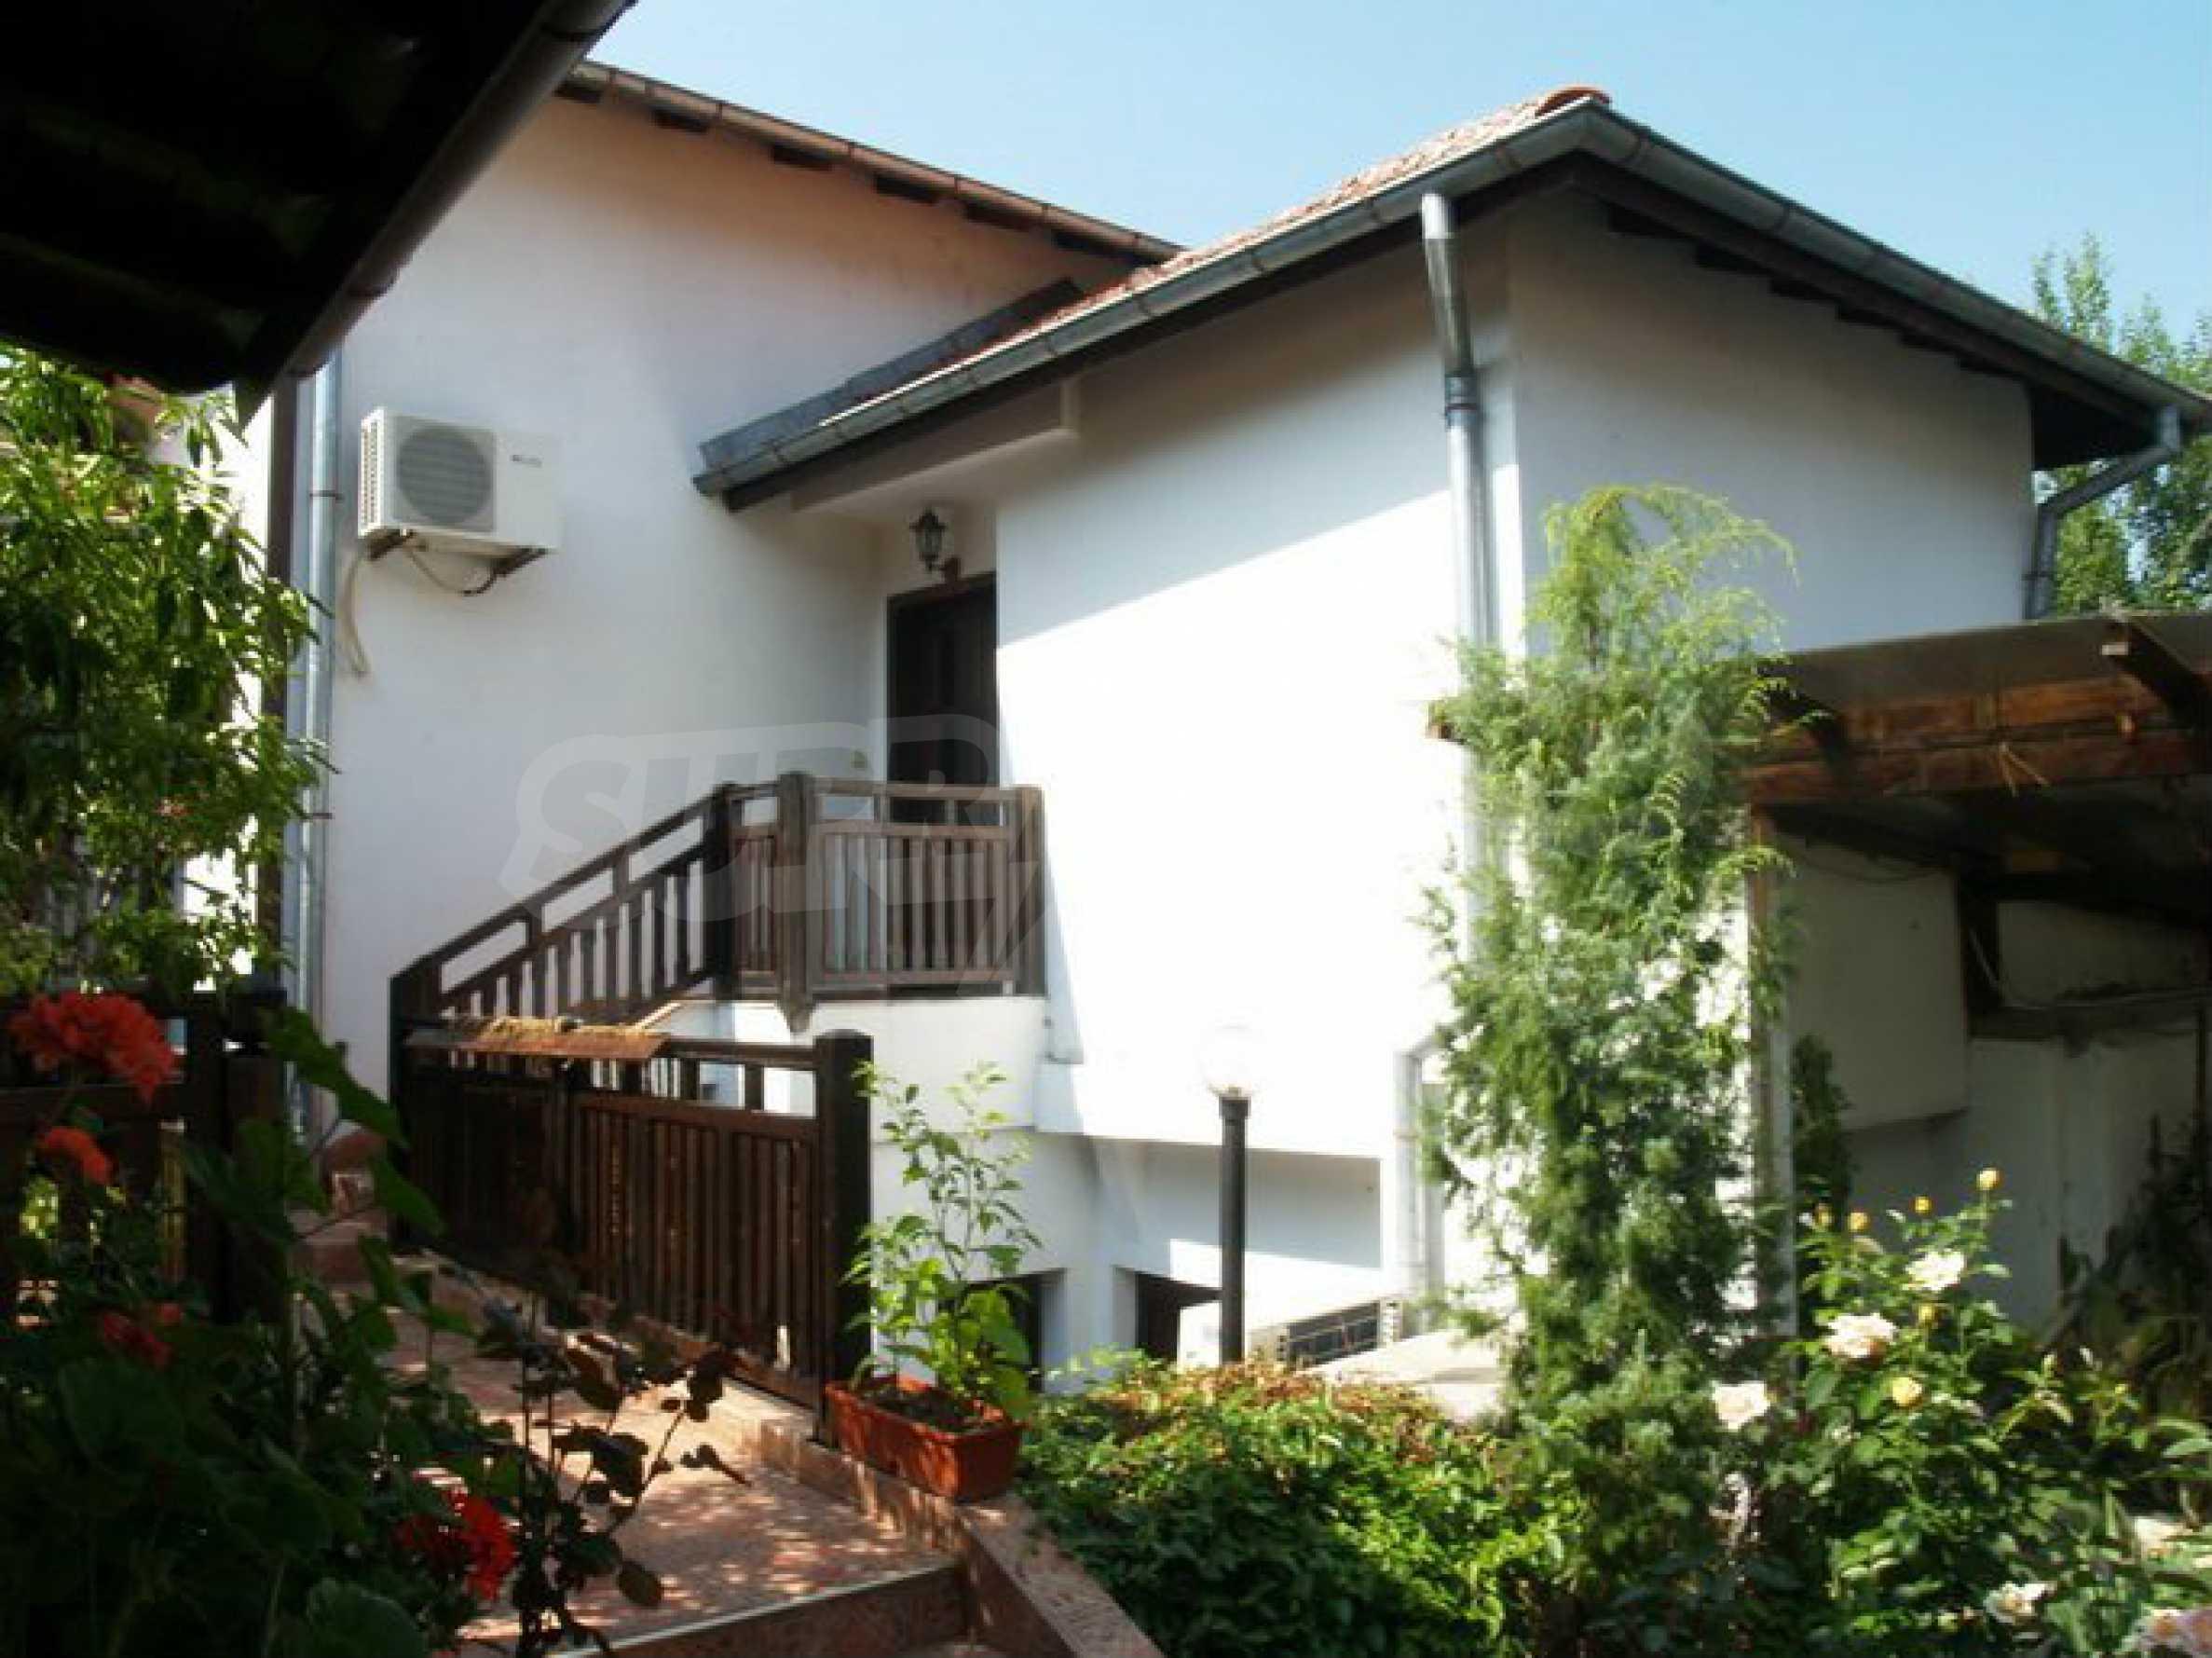 Hotelanlage mit Restaurant am Ufer des Flusses Osam in Lovech 14